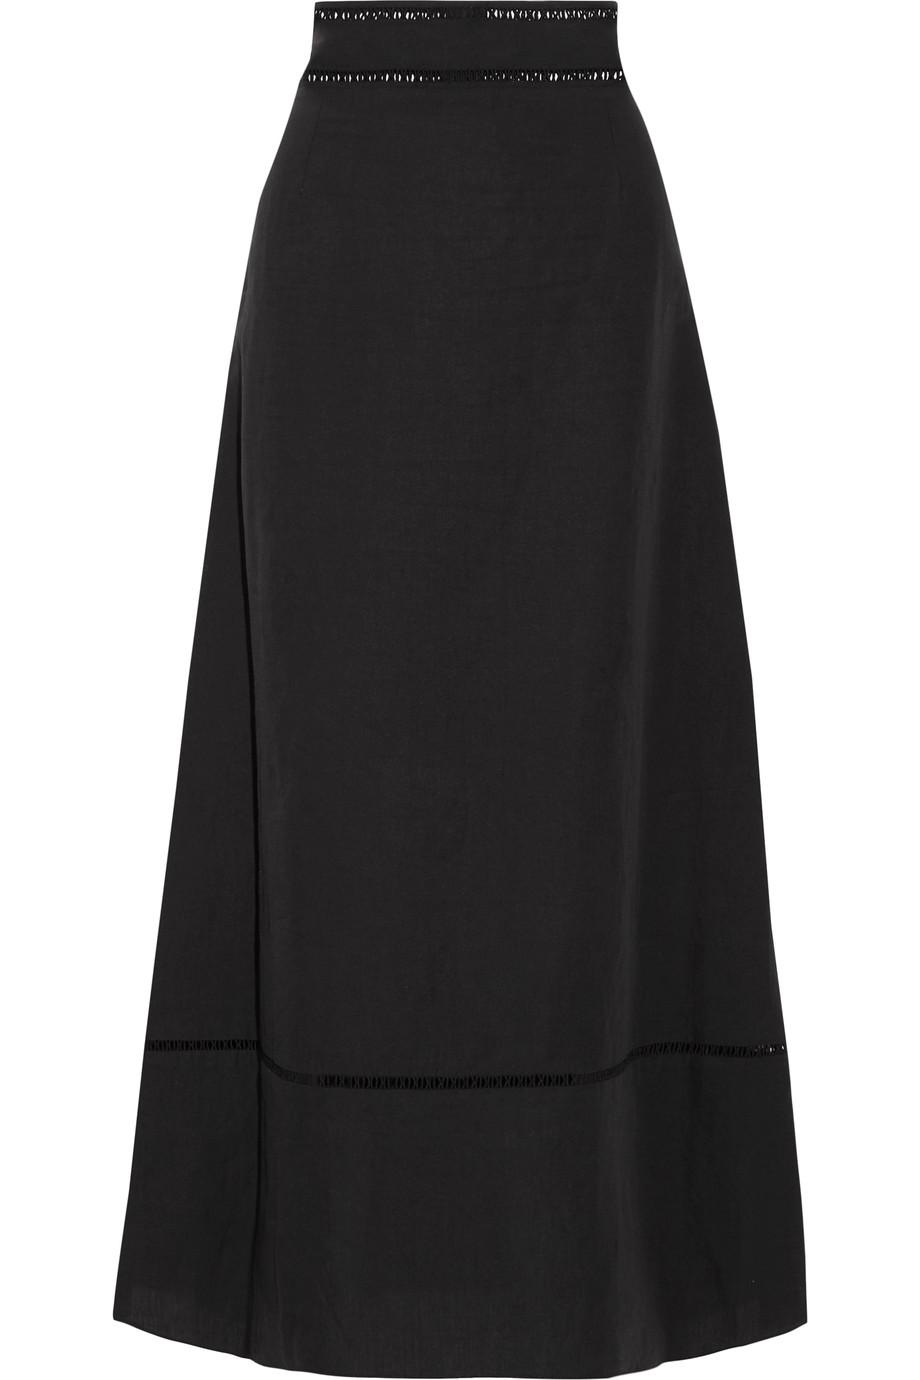 Isabel Marant Linens Riley open knit-trimmed linen and cotton-blend maxi skirt